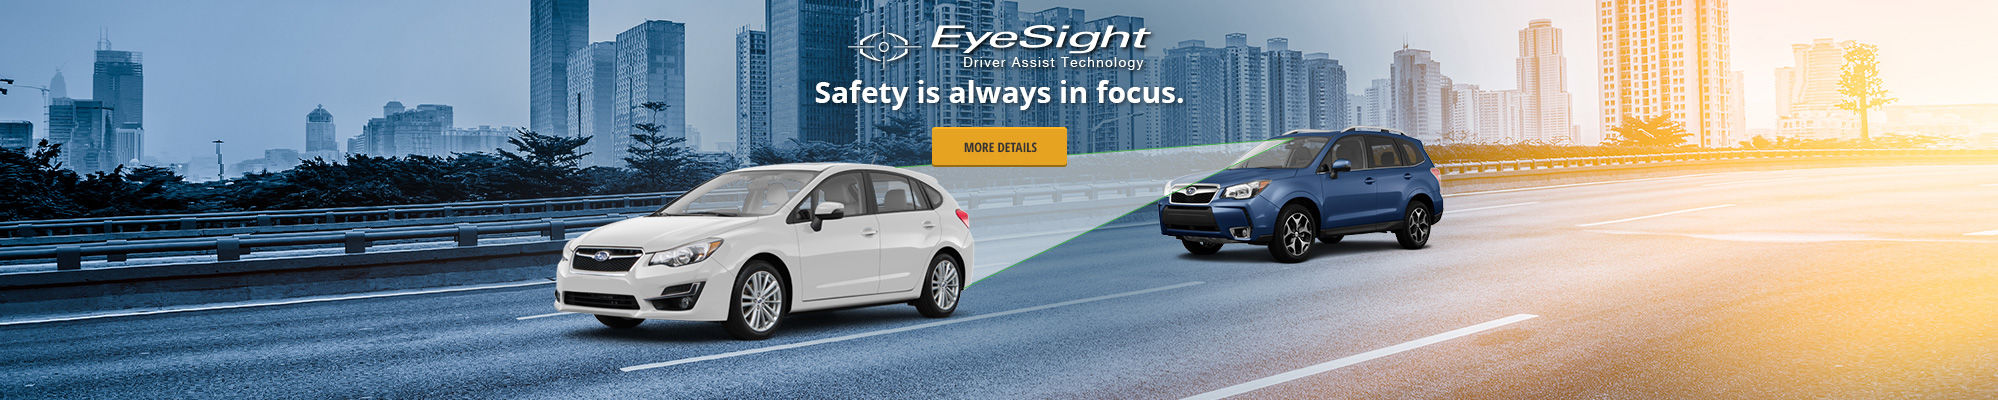 Eyesight - Drive Assist Technology